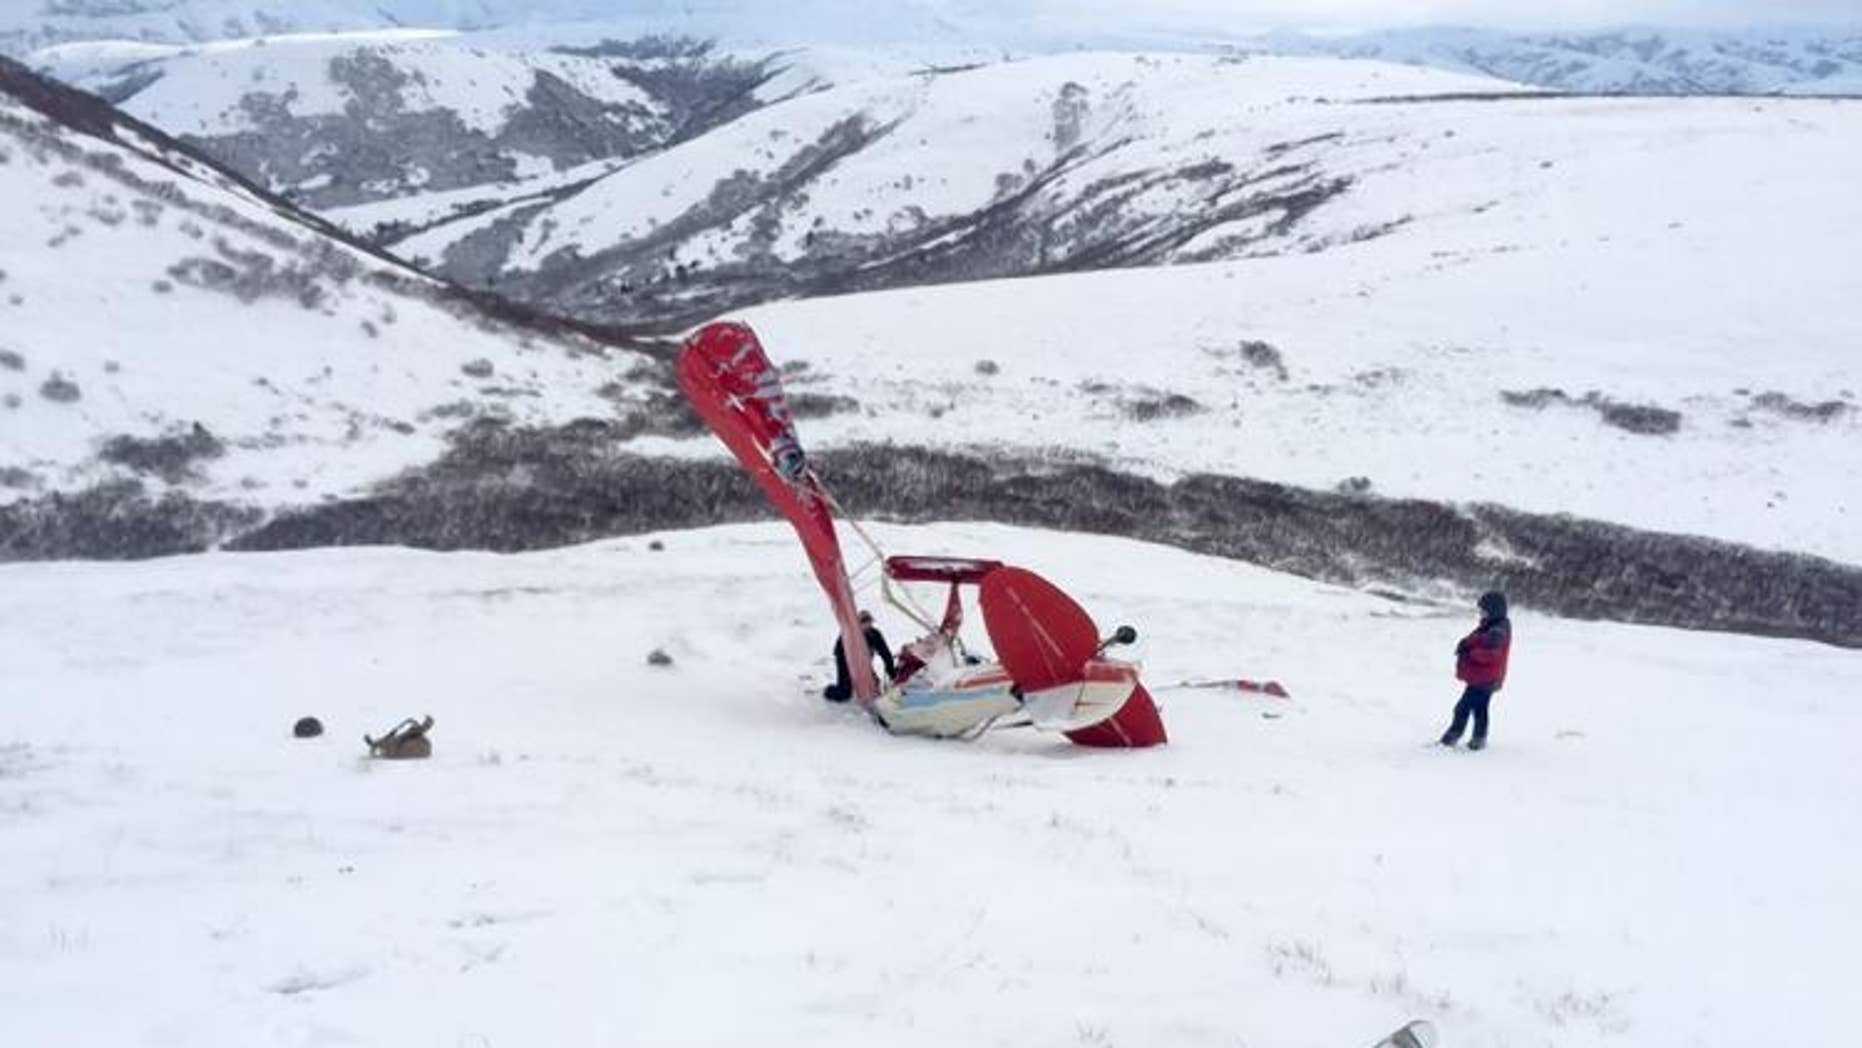 The plane crashed on Marvel Dome in Alaska in December 2016.